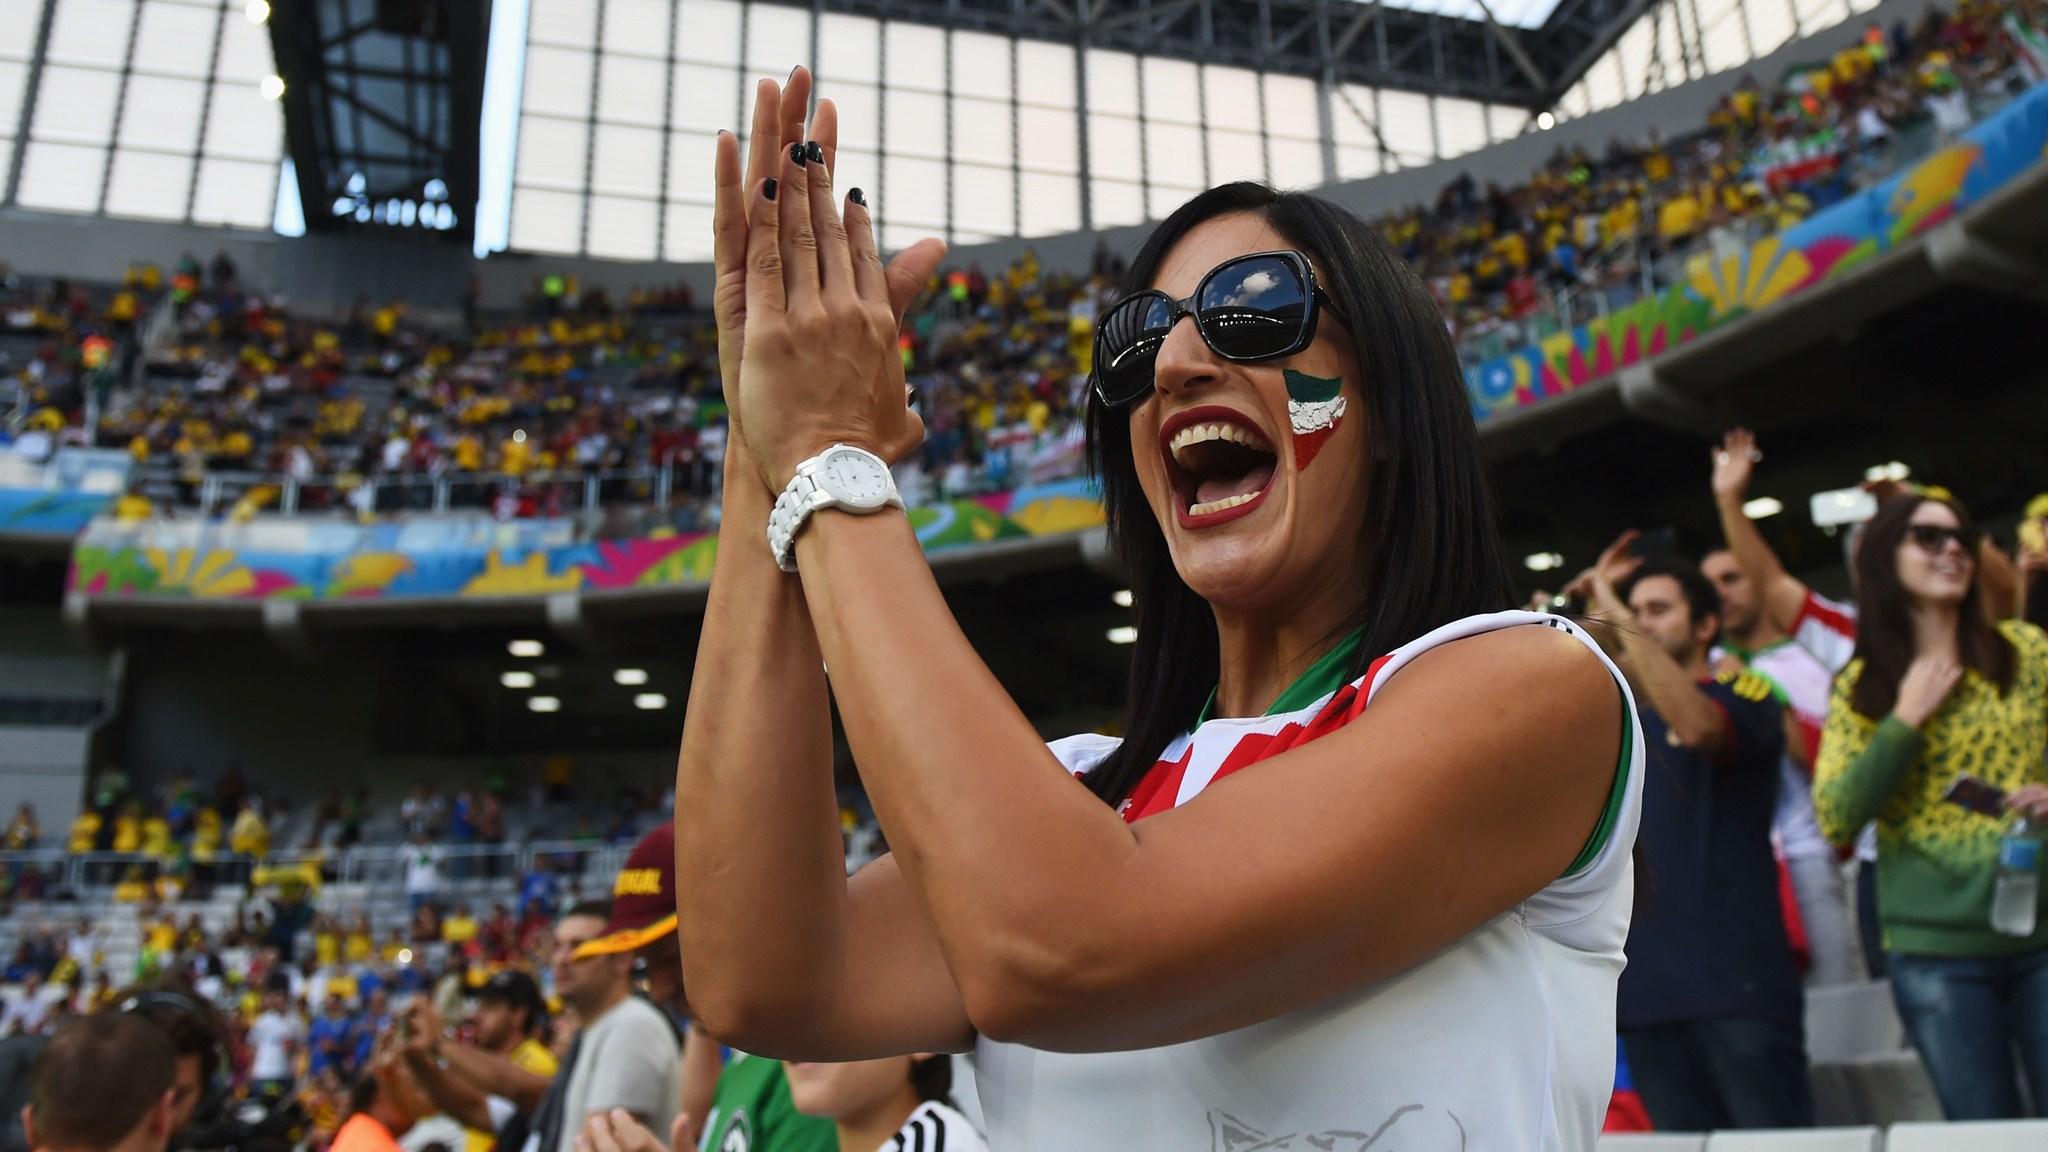 62 - Iran-Nigeria [0-0] -- 16 Jun 2014 - 16-00 -- Curitiba - Arena da Baixada